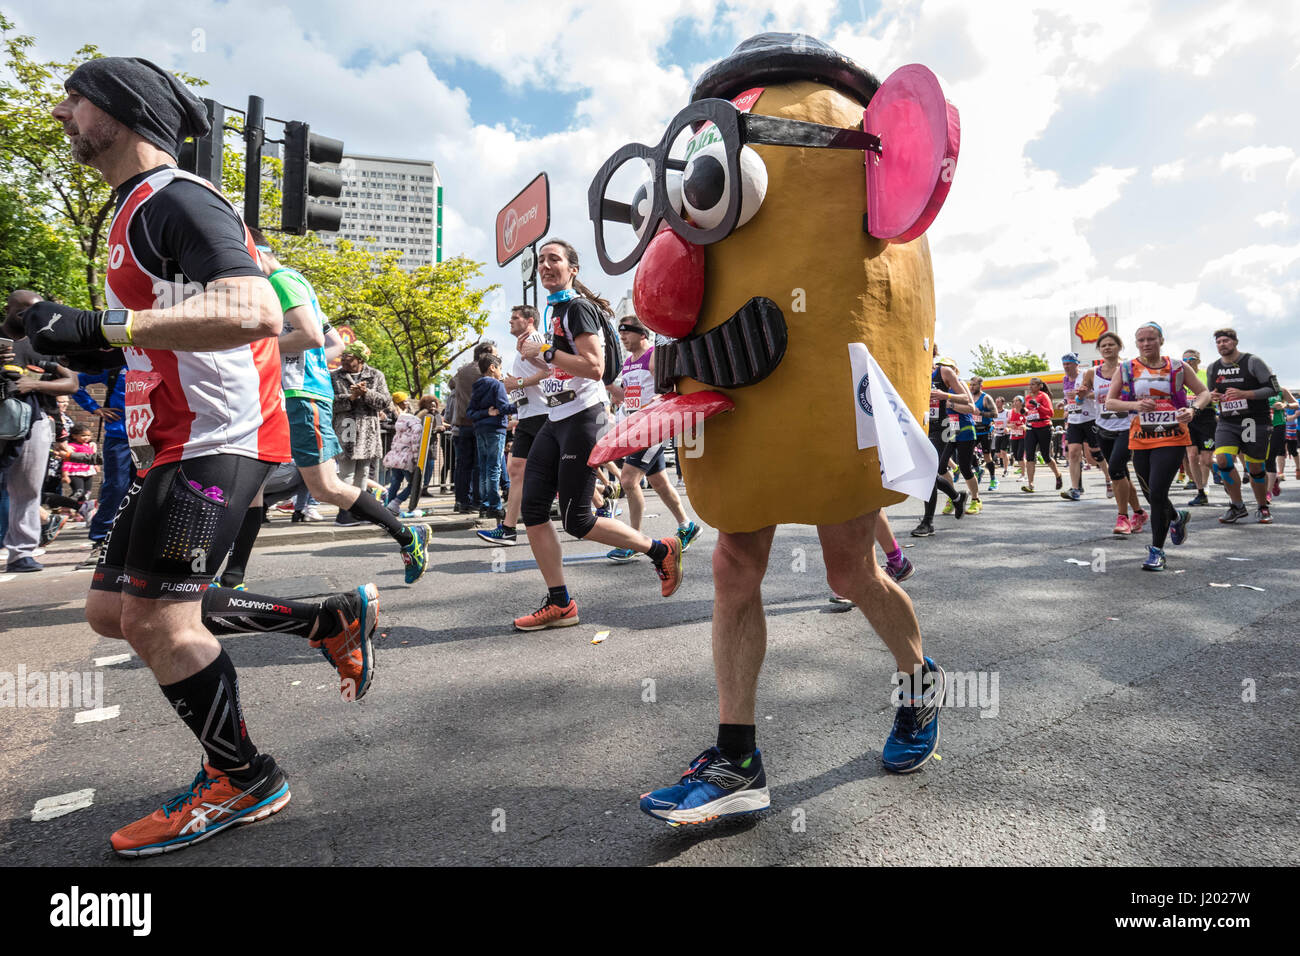 London, UK. 23rd Apr, 2017. London Marathon passes through Deptford Credit: Guy Corbishley/Alamy Live News - Stock Image